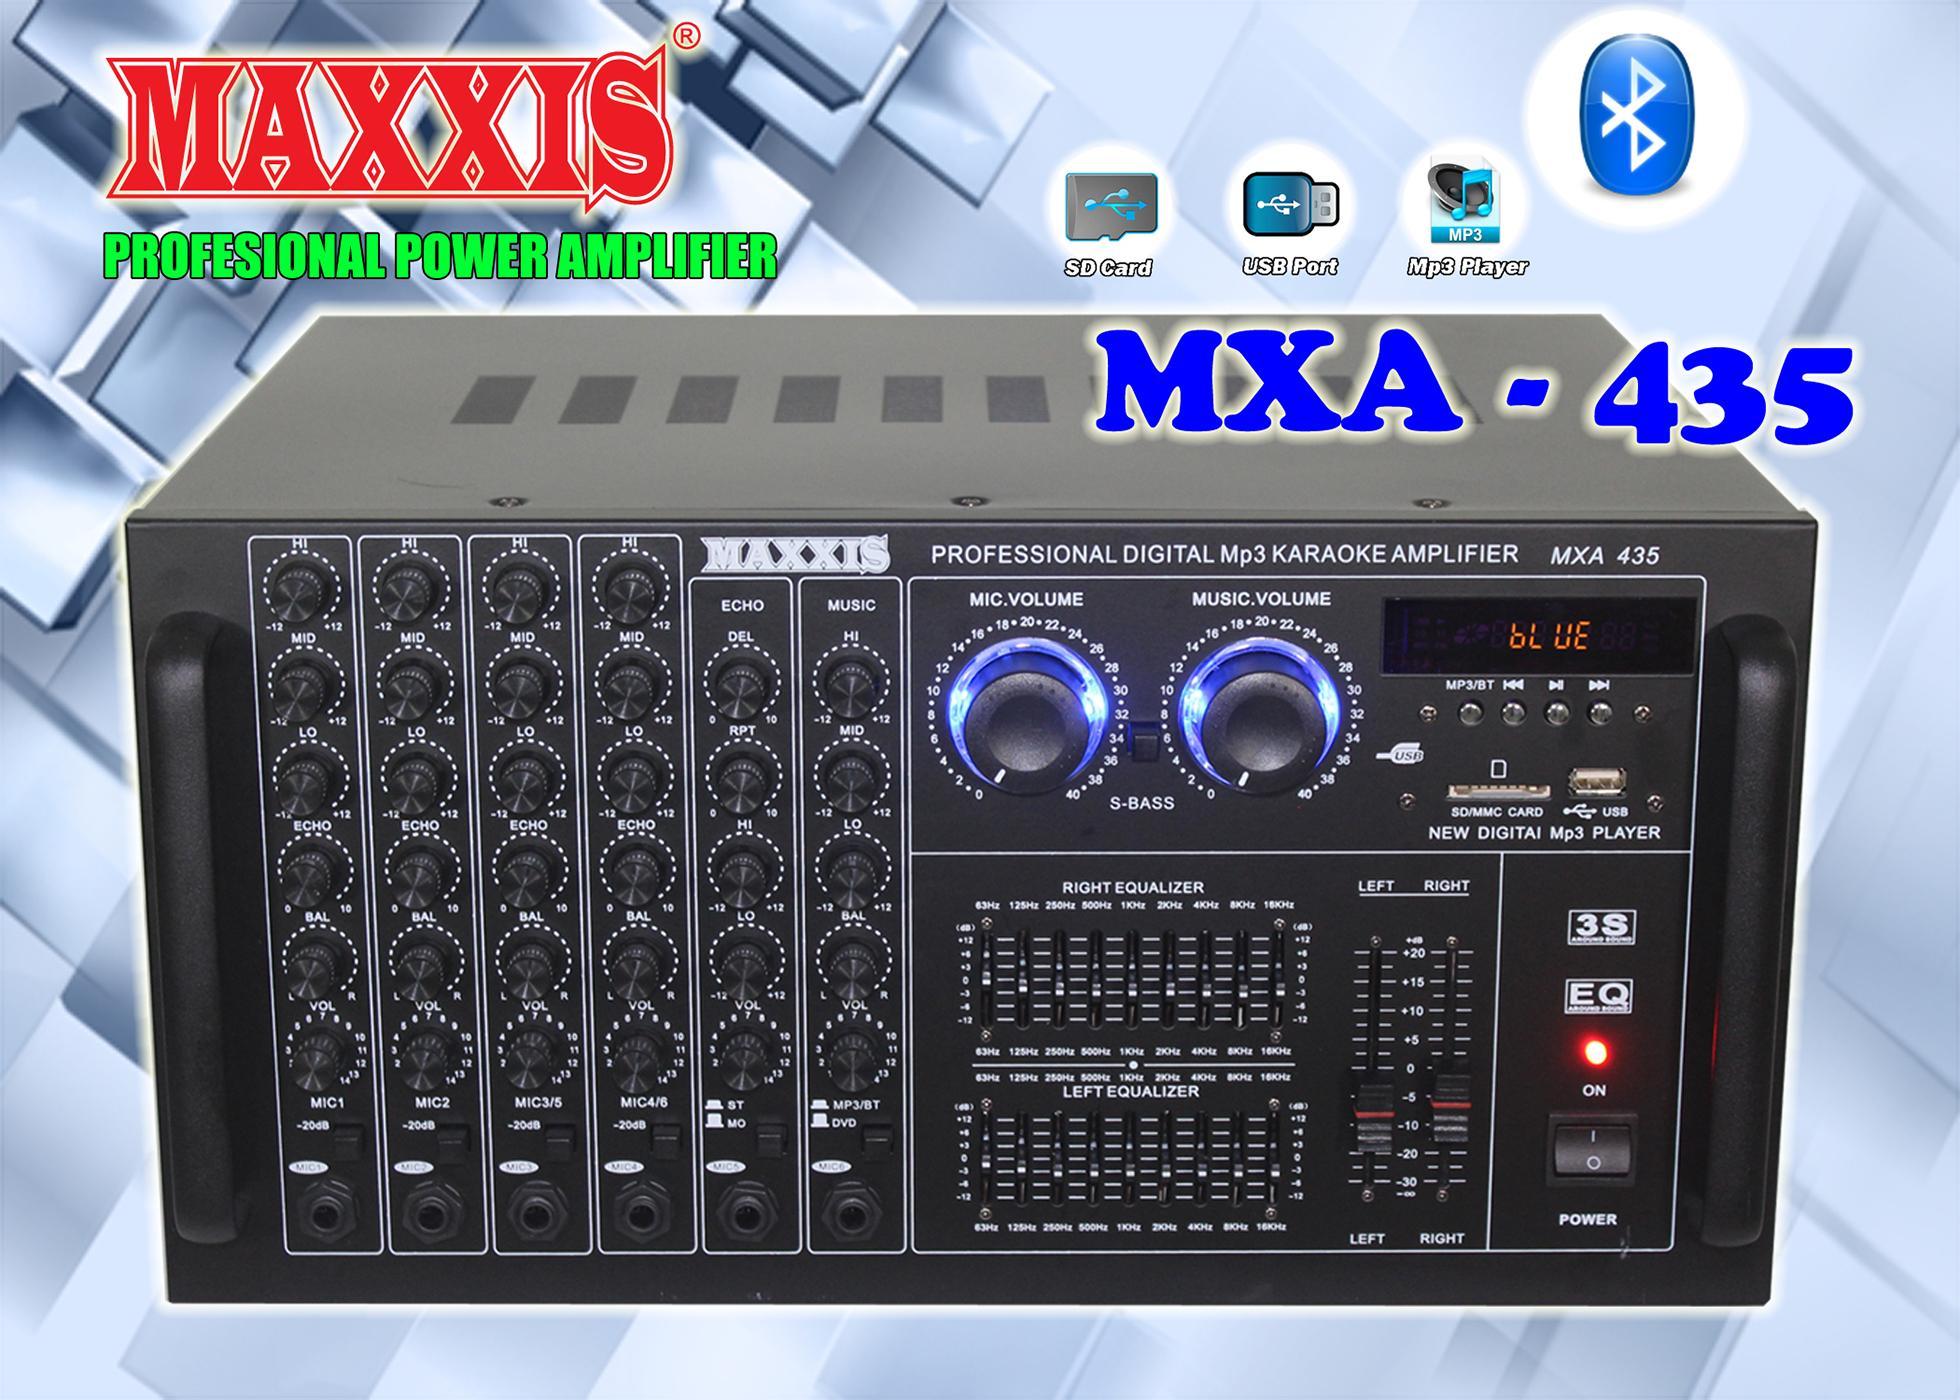 Jual Produk Maxxis Terbaru   lazada.co.id